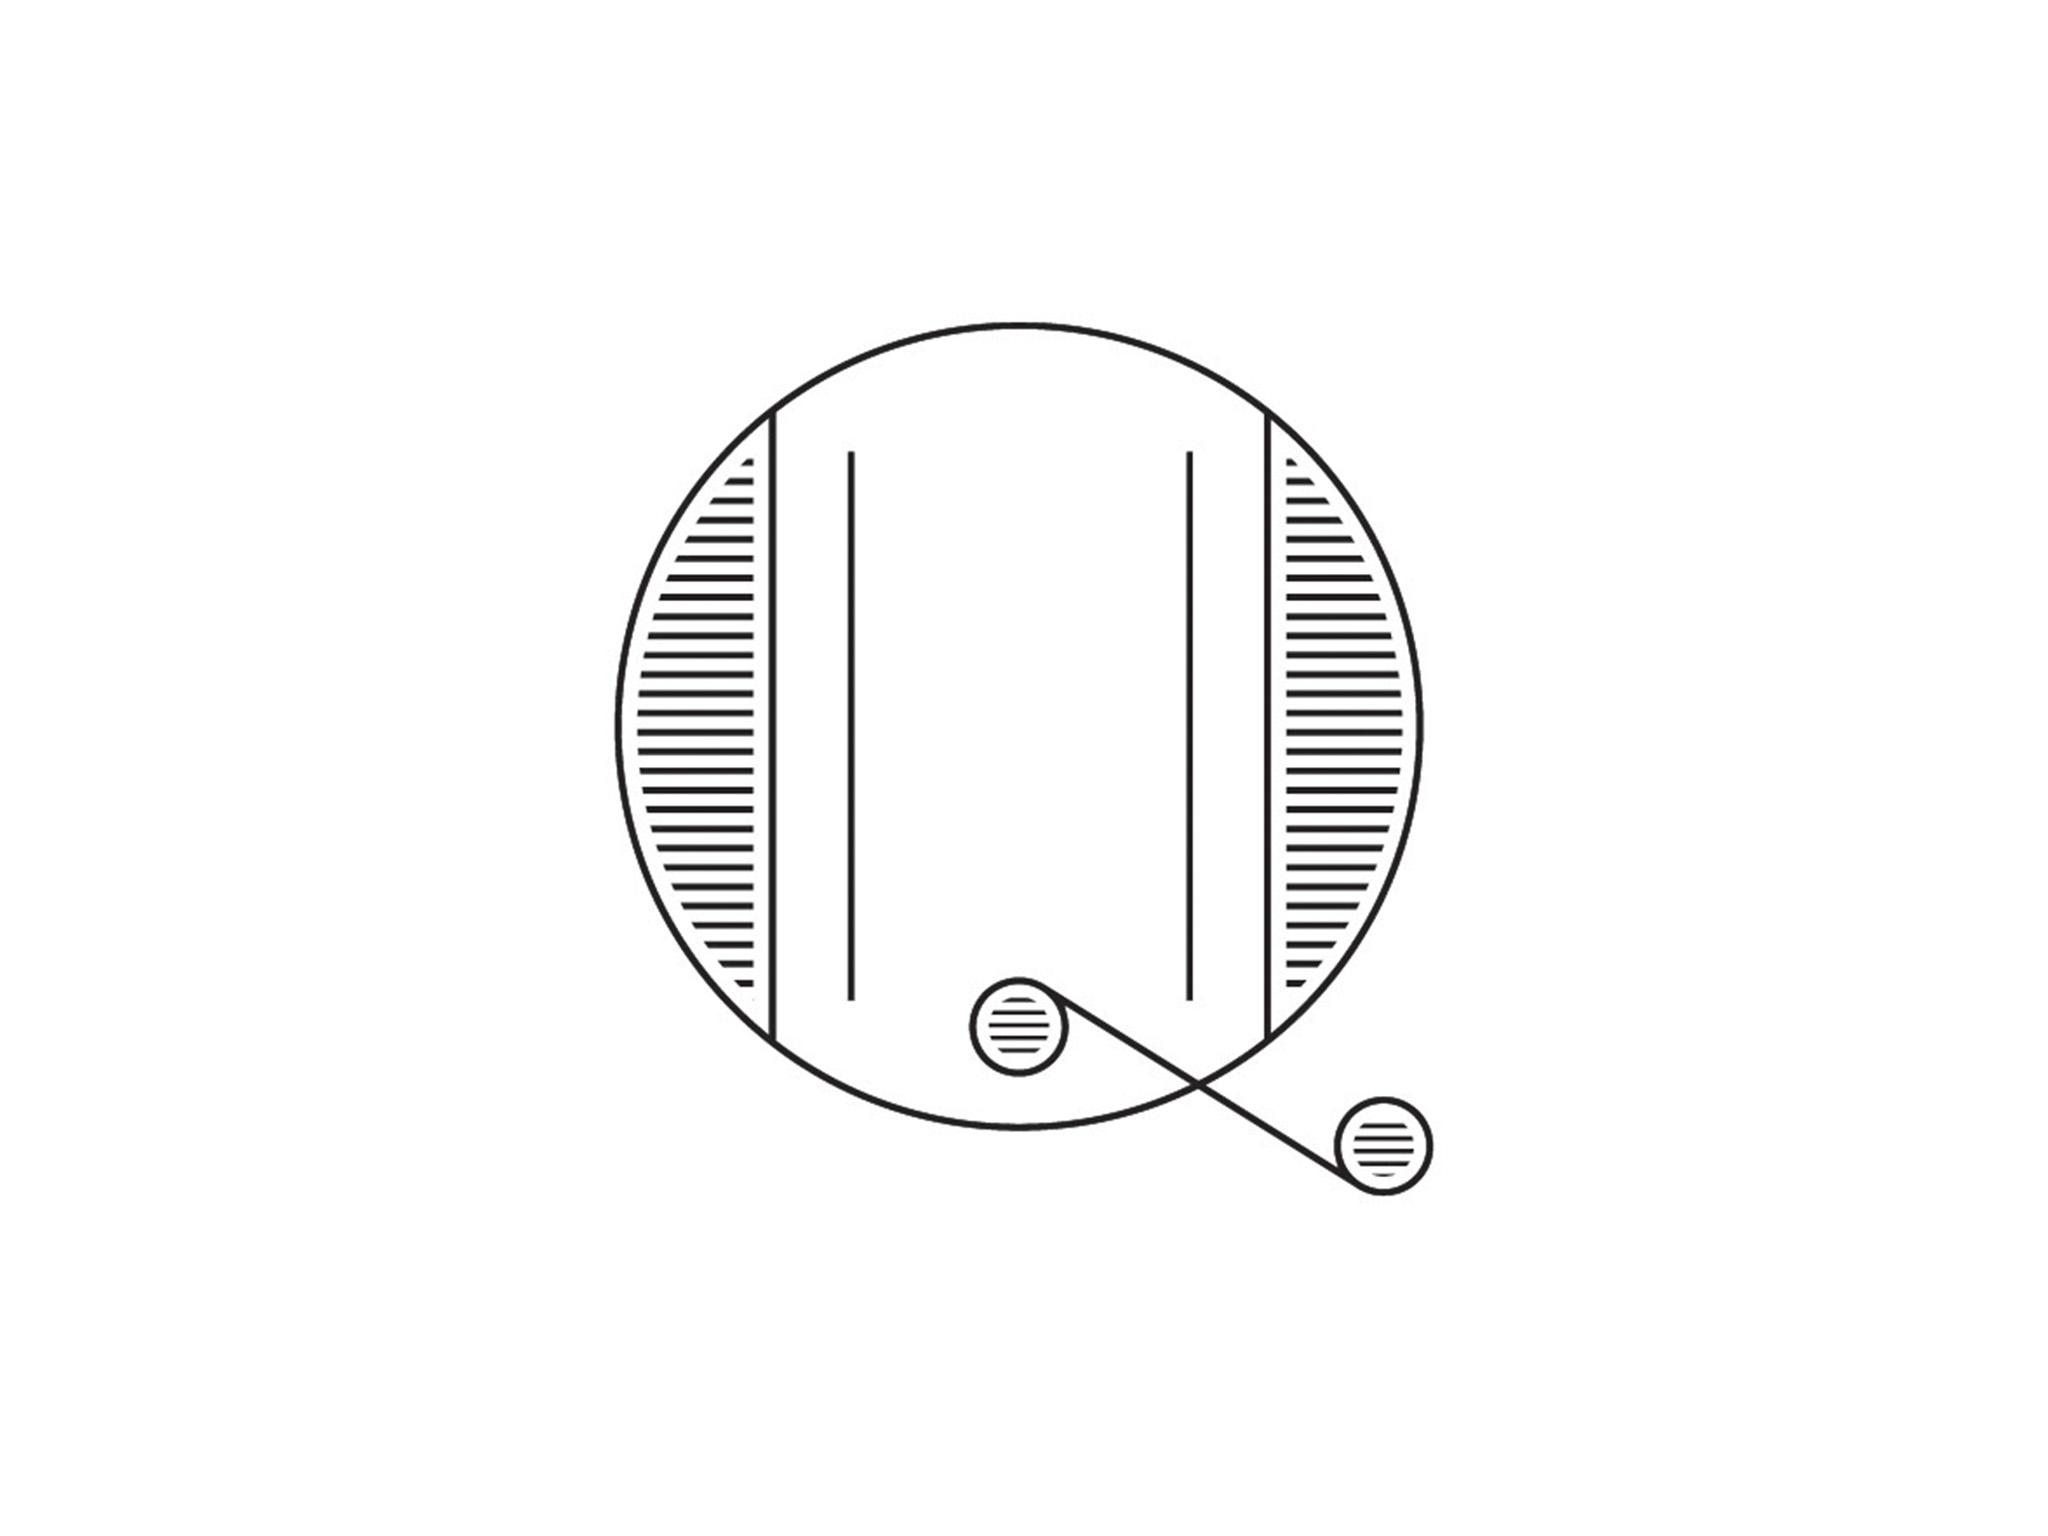 apex_letters_horizontal_large_0023_2_final_alphabet coasters-17.jpg